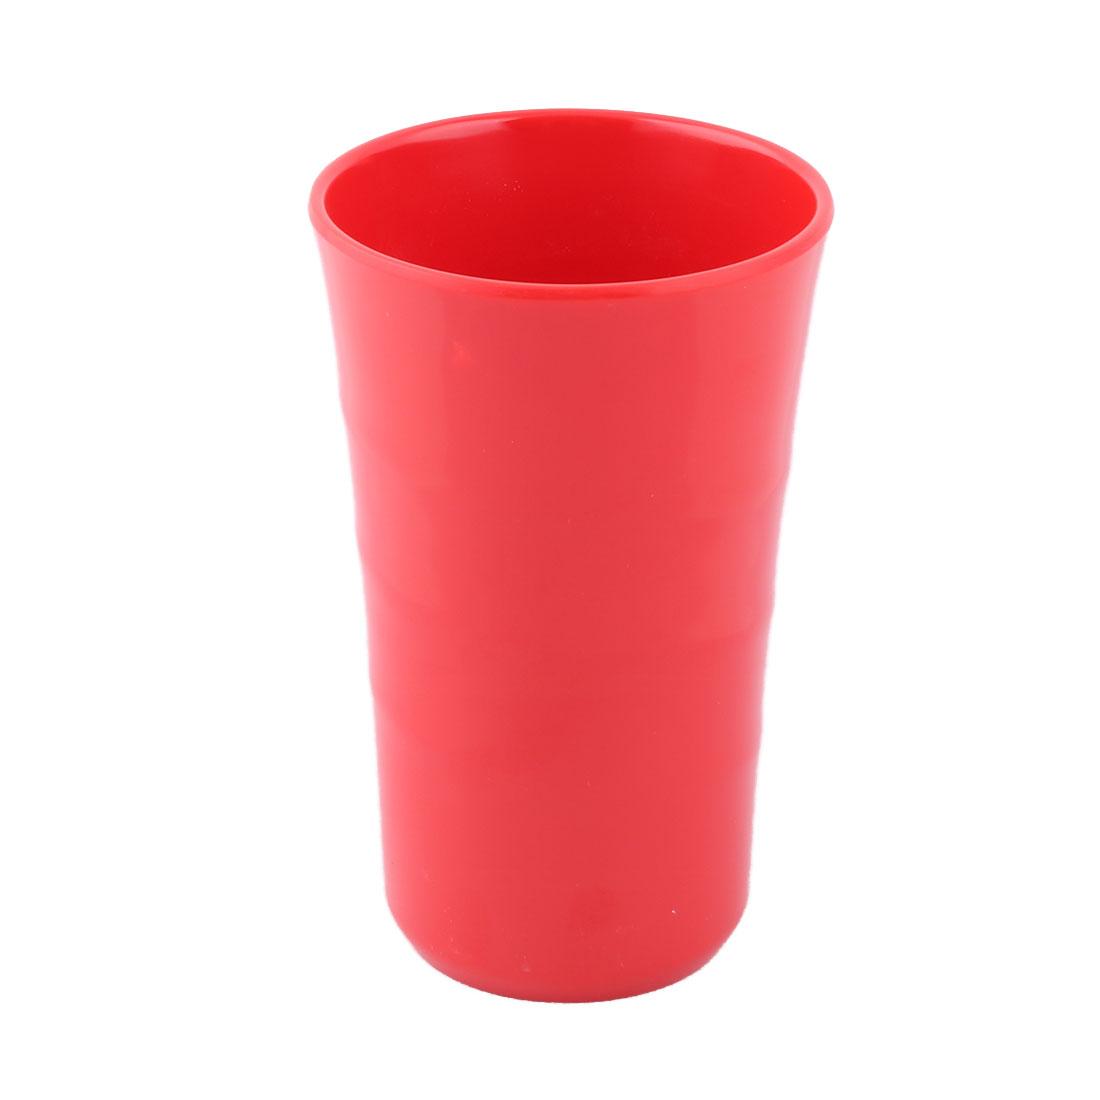 Household Melamine Round Coffee Tea Water Milk Juice Drinking Cup Mug Red 400ml